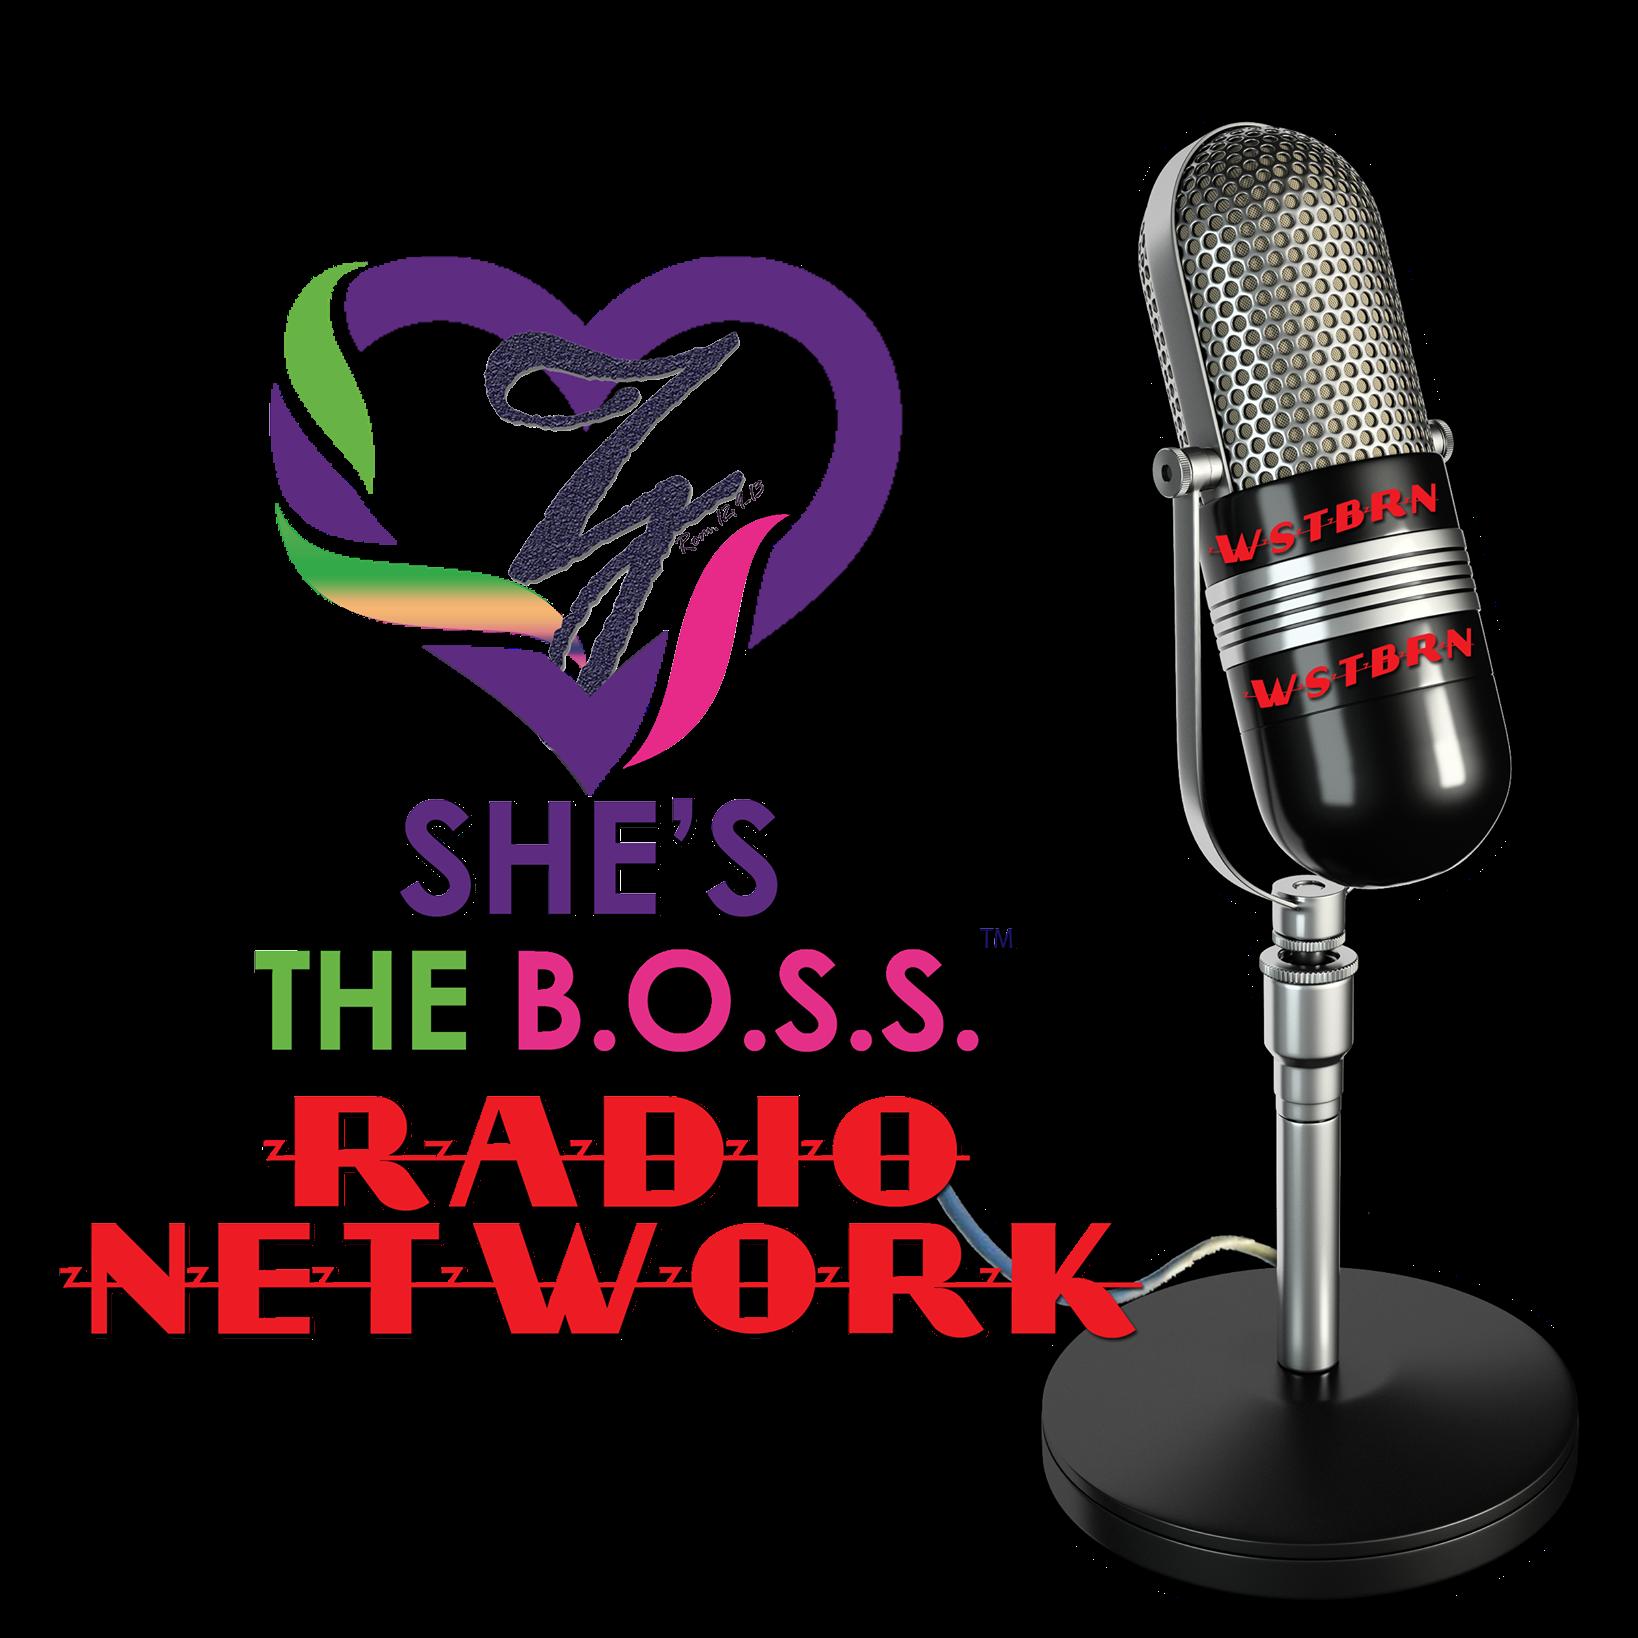 WSTBRN She's The B.O.S.S. Radio Network